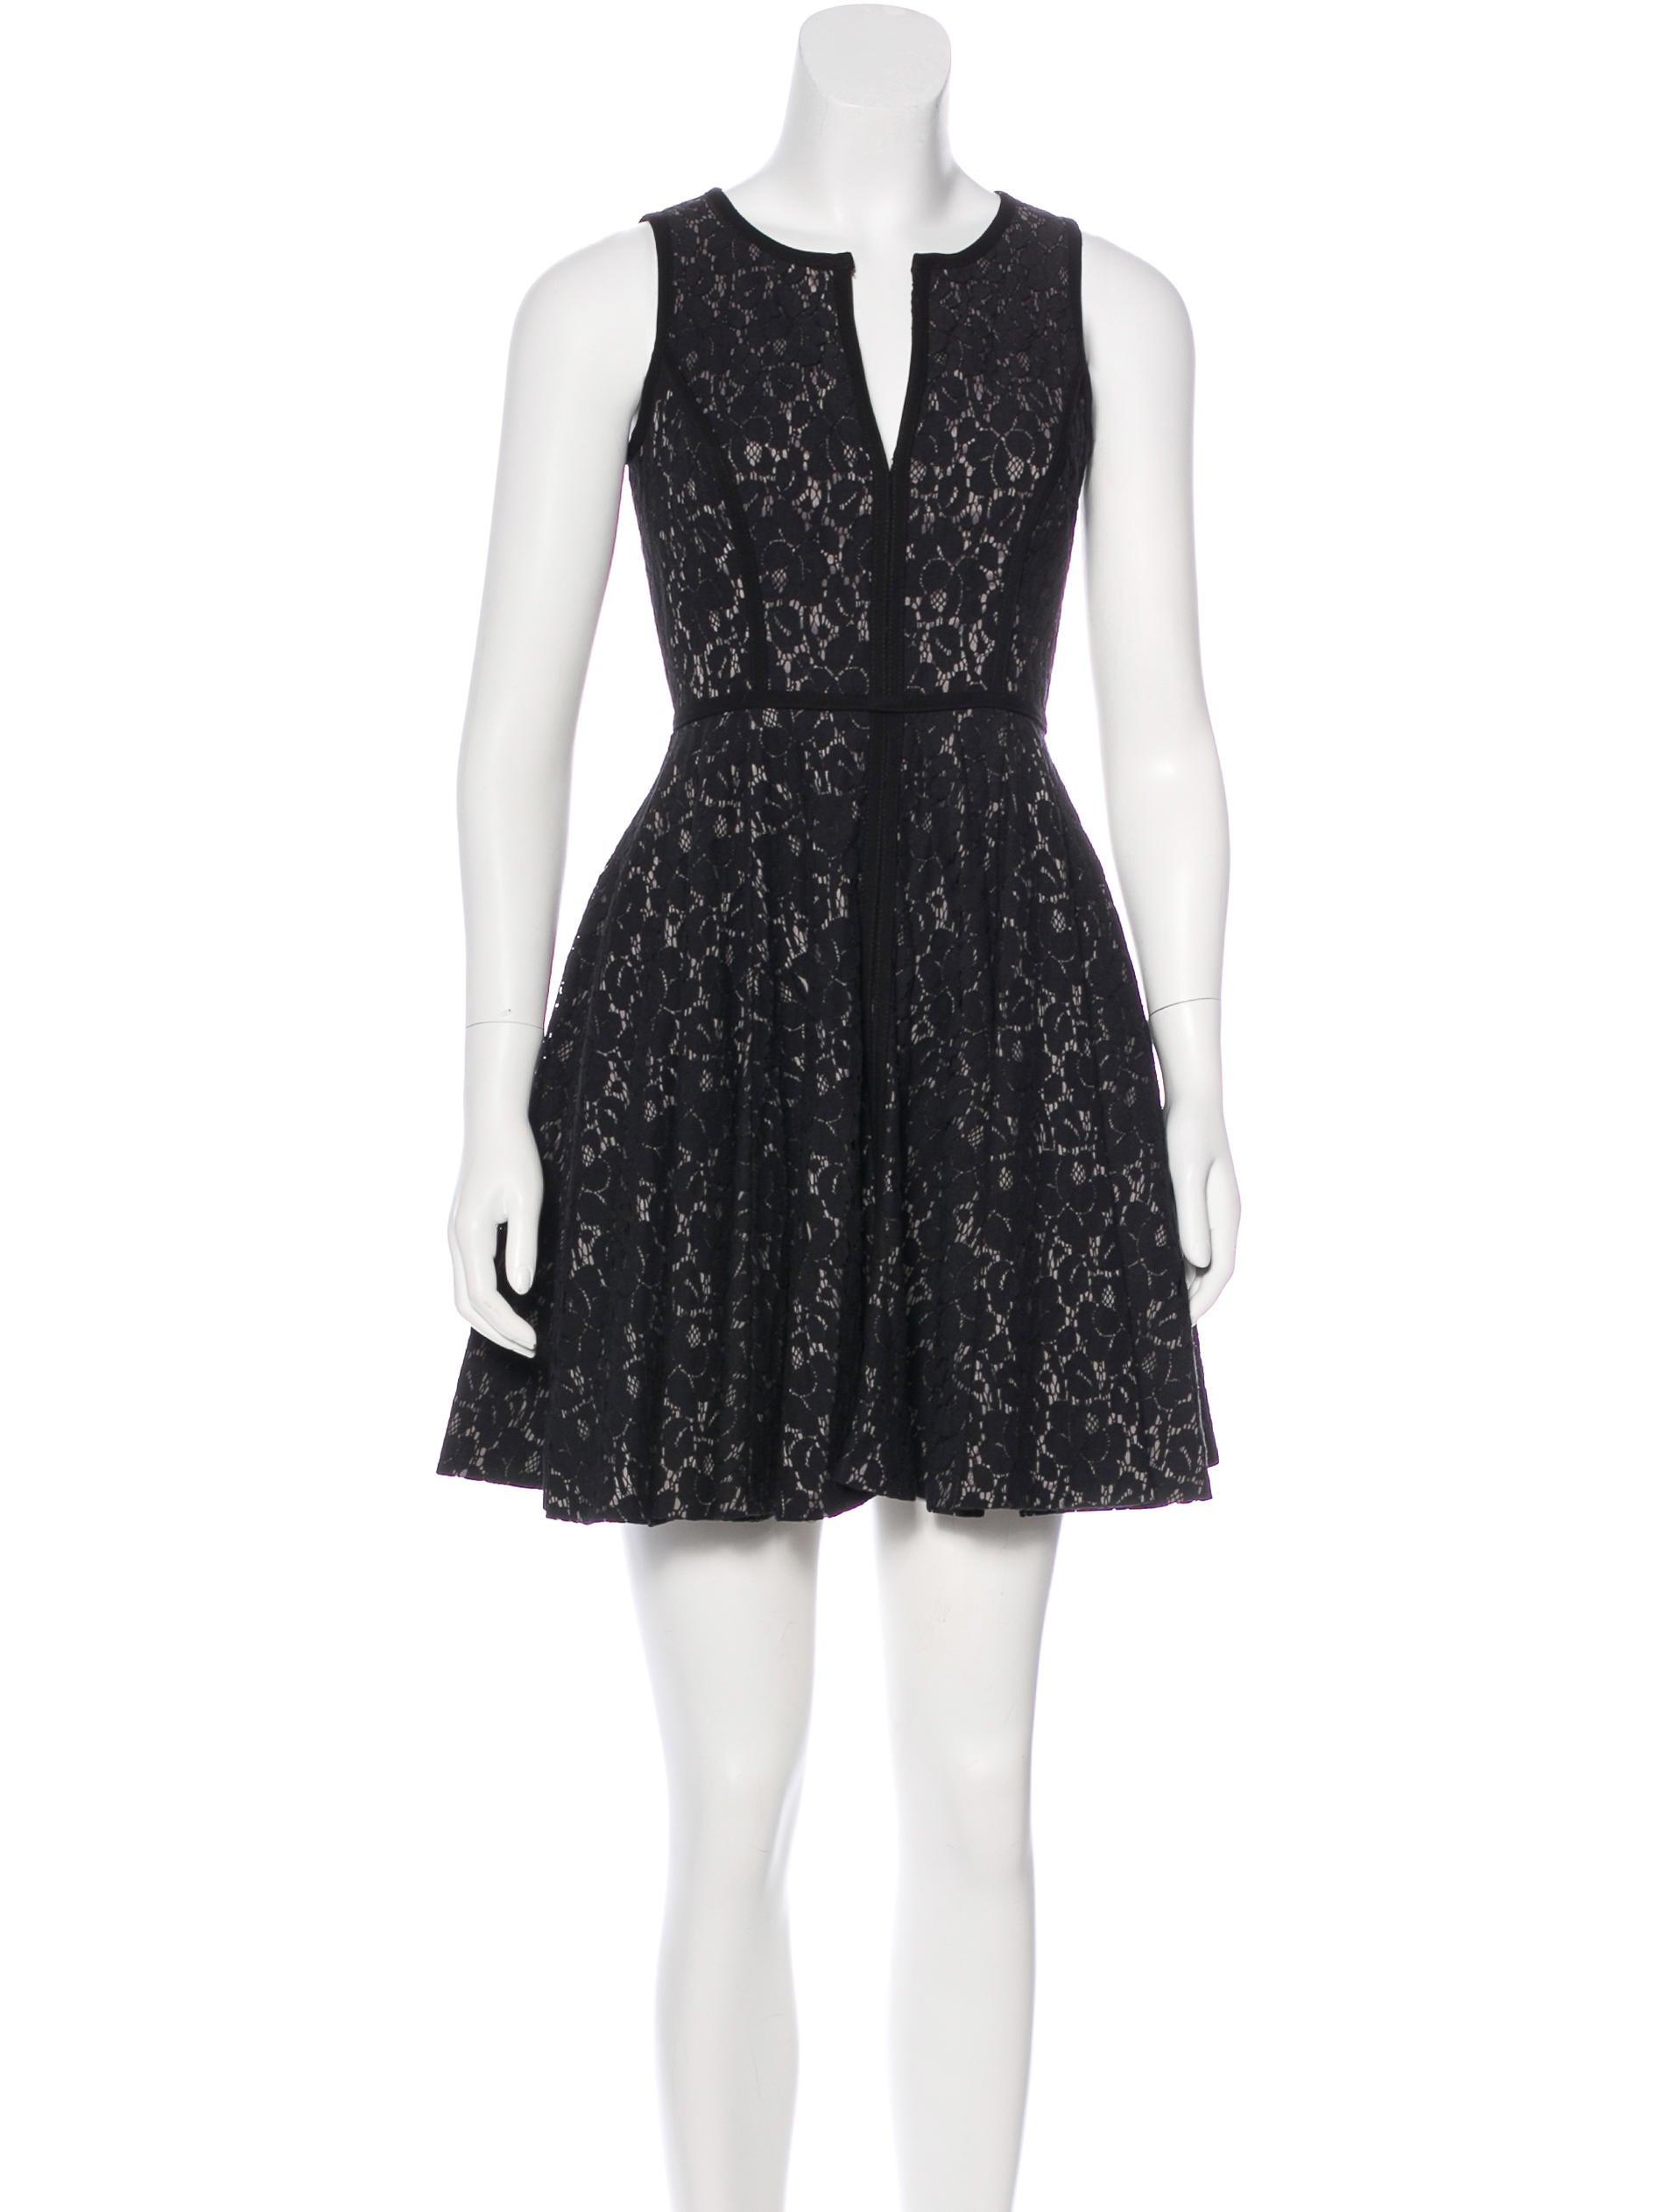 Sexy Women Black Sleeveless Lace Slim Bodycon Party Evening Cocktail Mini Dress.